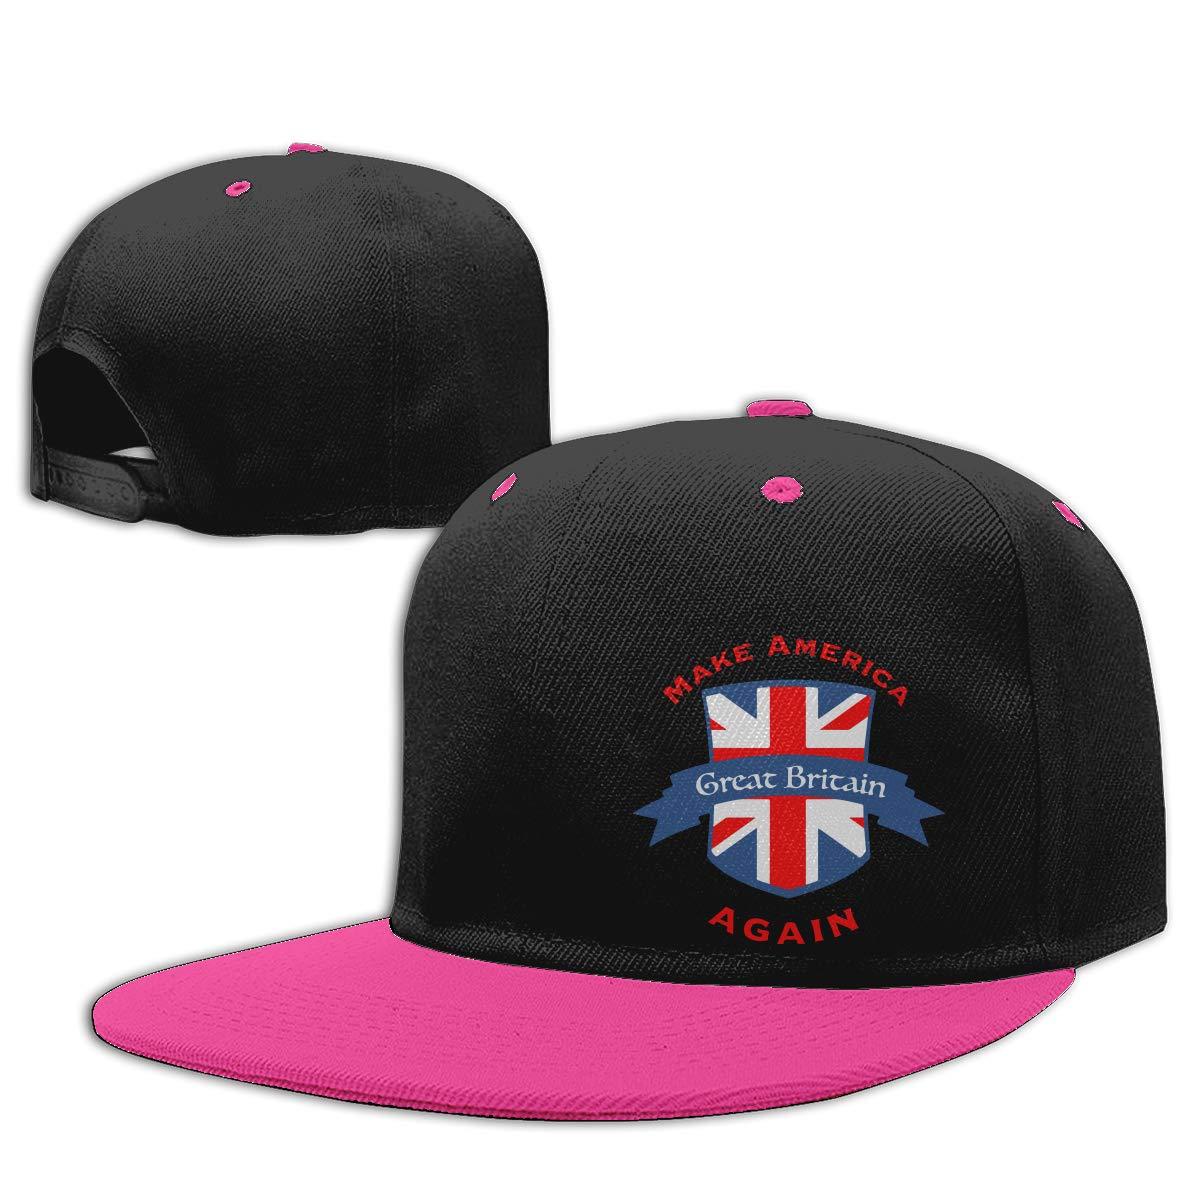 FGGfgg Make America Great Britain Again Pattern Print Adjustable Hip Hop Baseball Cap Visor Adult Baseball Cap